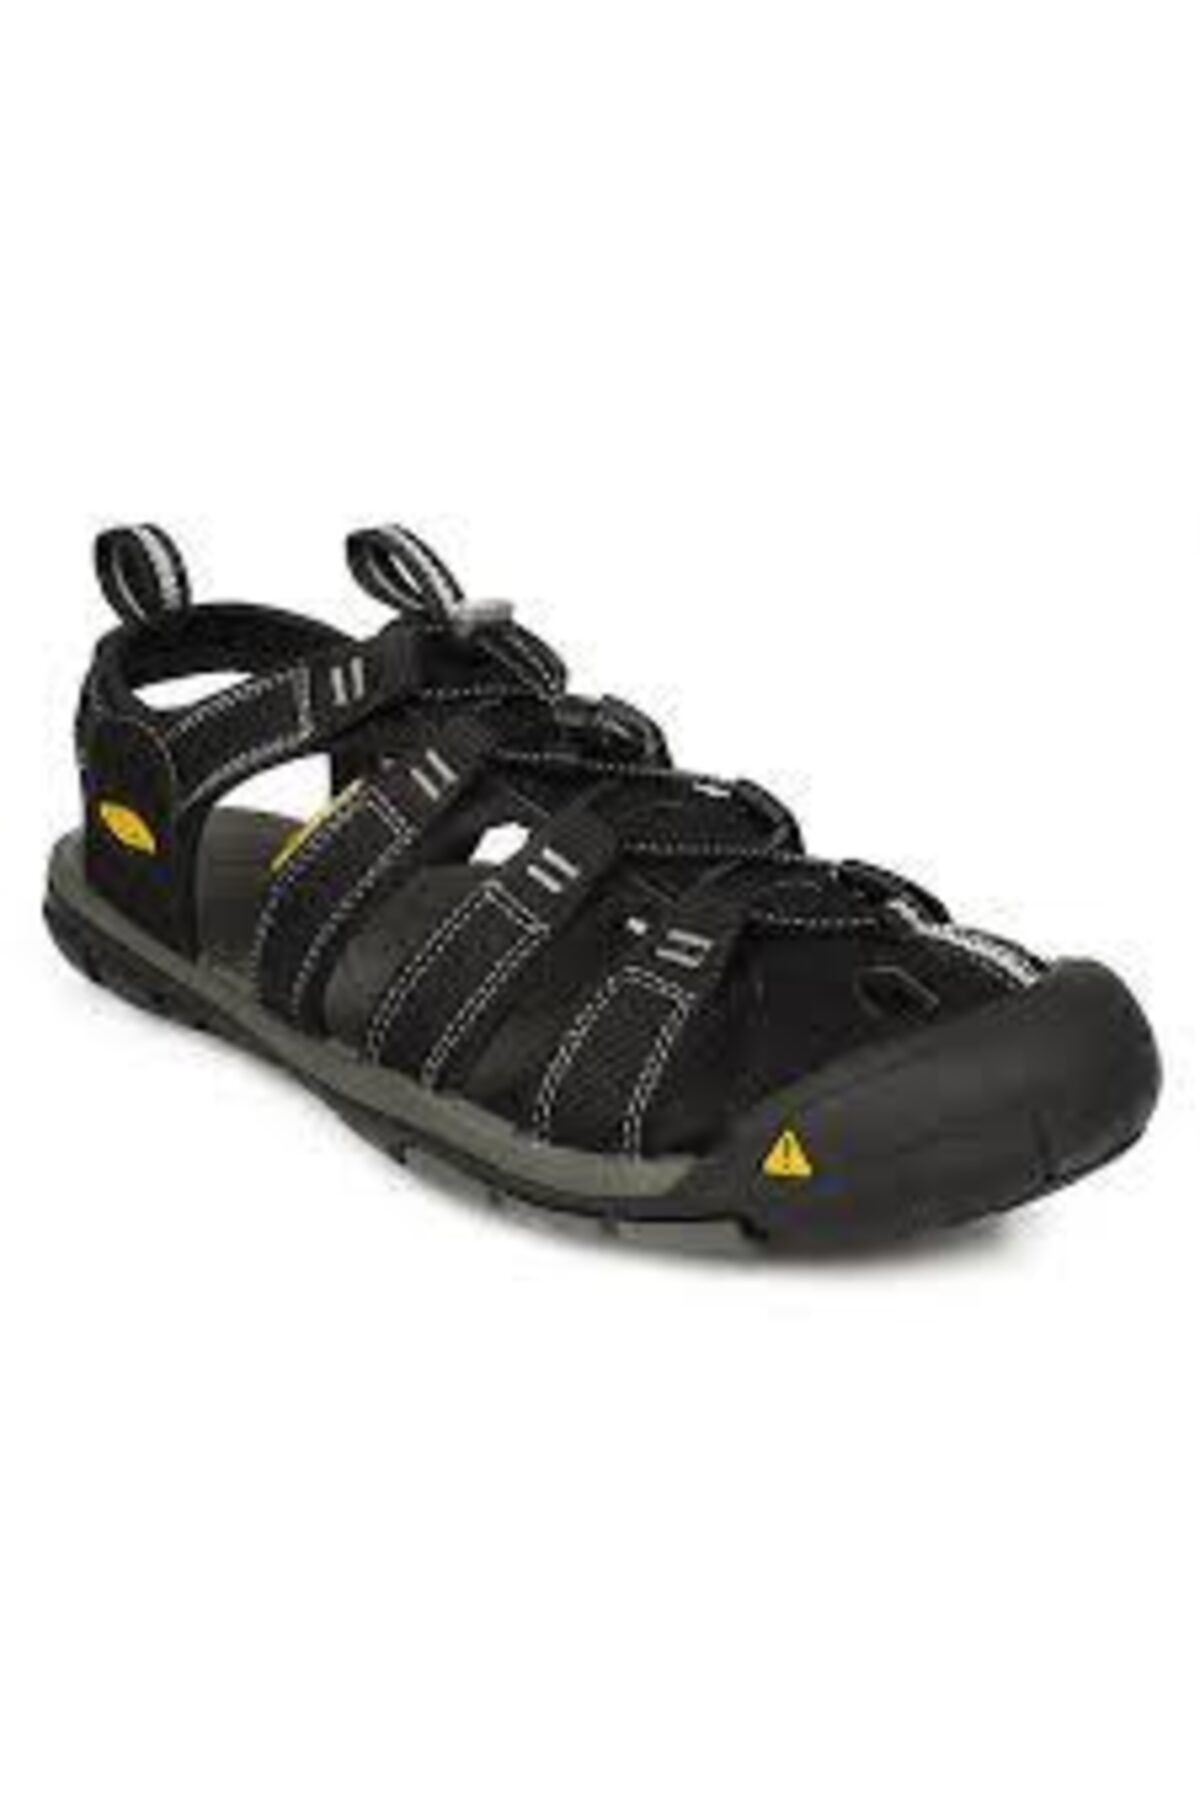 Keen 1020662 Clearwater Cnx Outdoor Siyah Kadın Sandalet 1